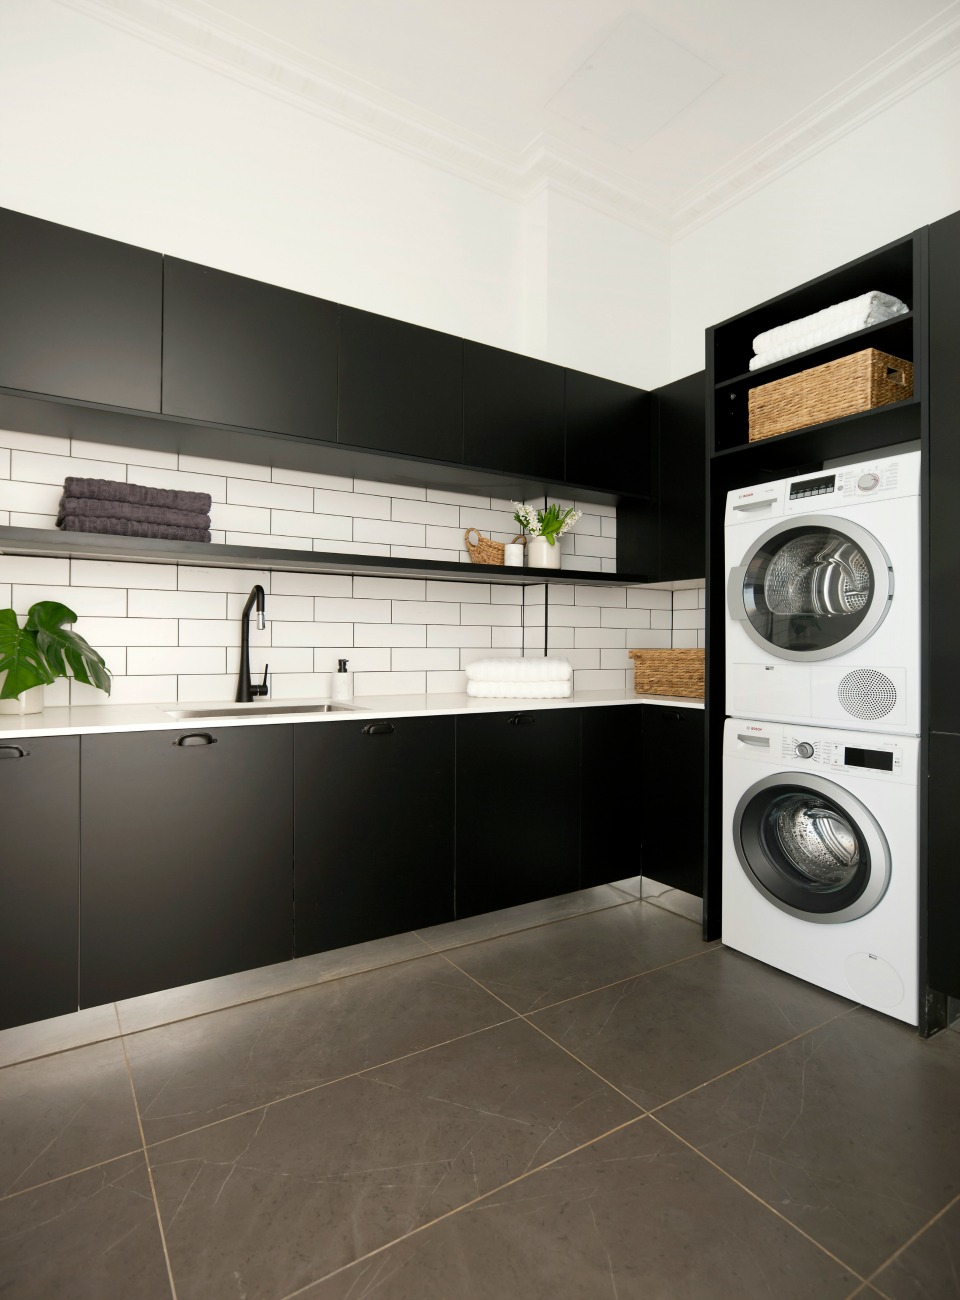 Laundry Rooms Designs: Darren Palmer's Top Laundry Design Tips